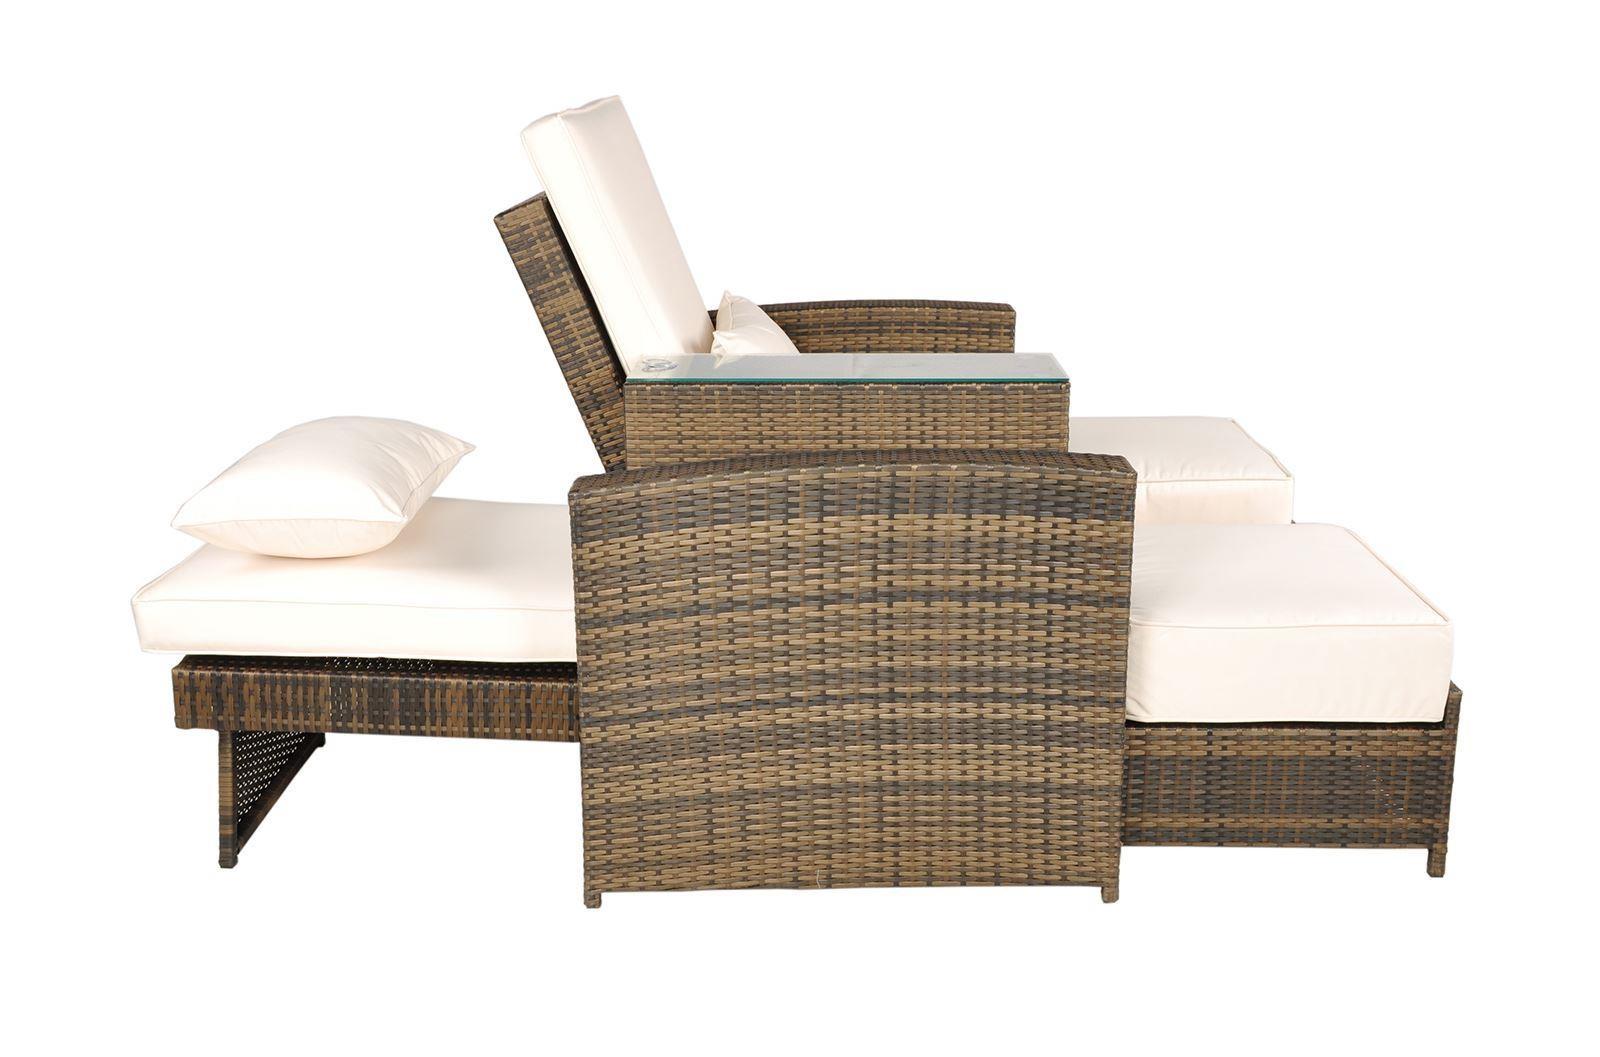 Nevada Garden Furniture 2 Seat Lounger